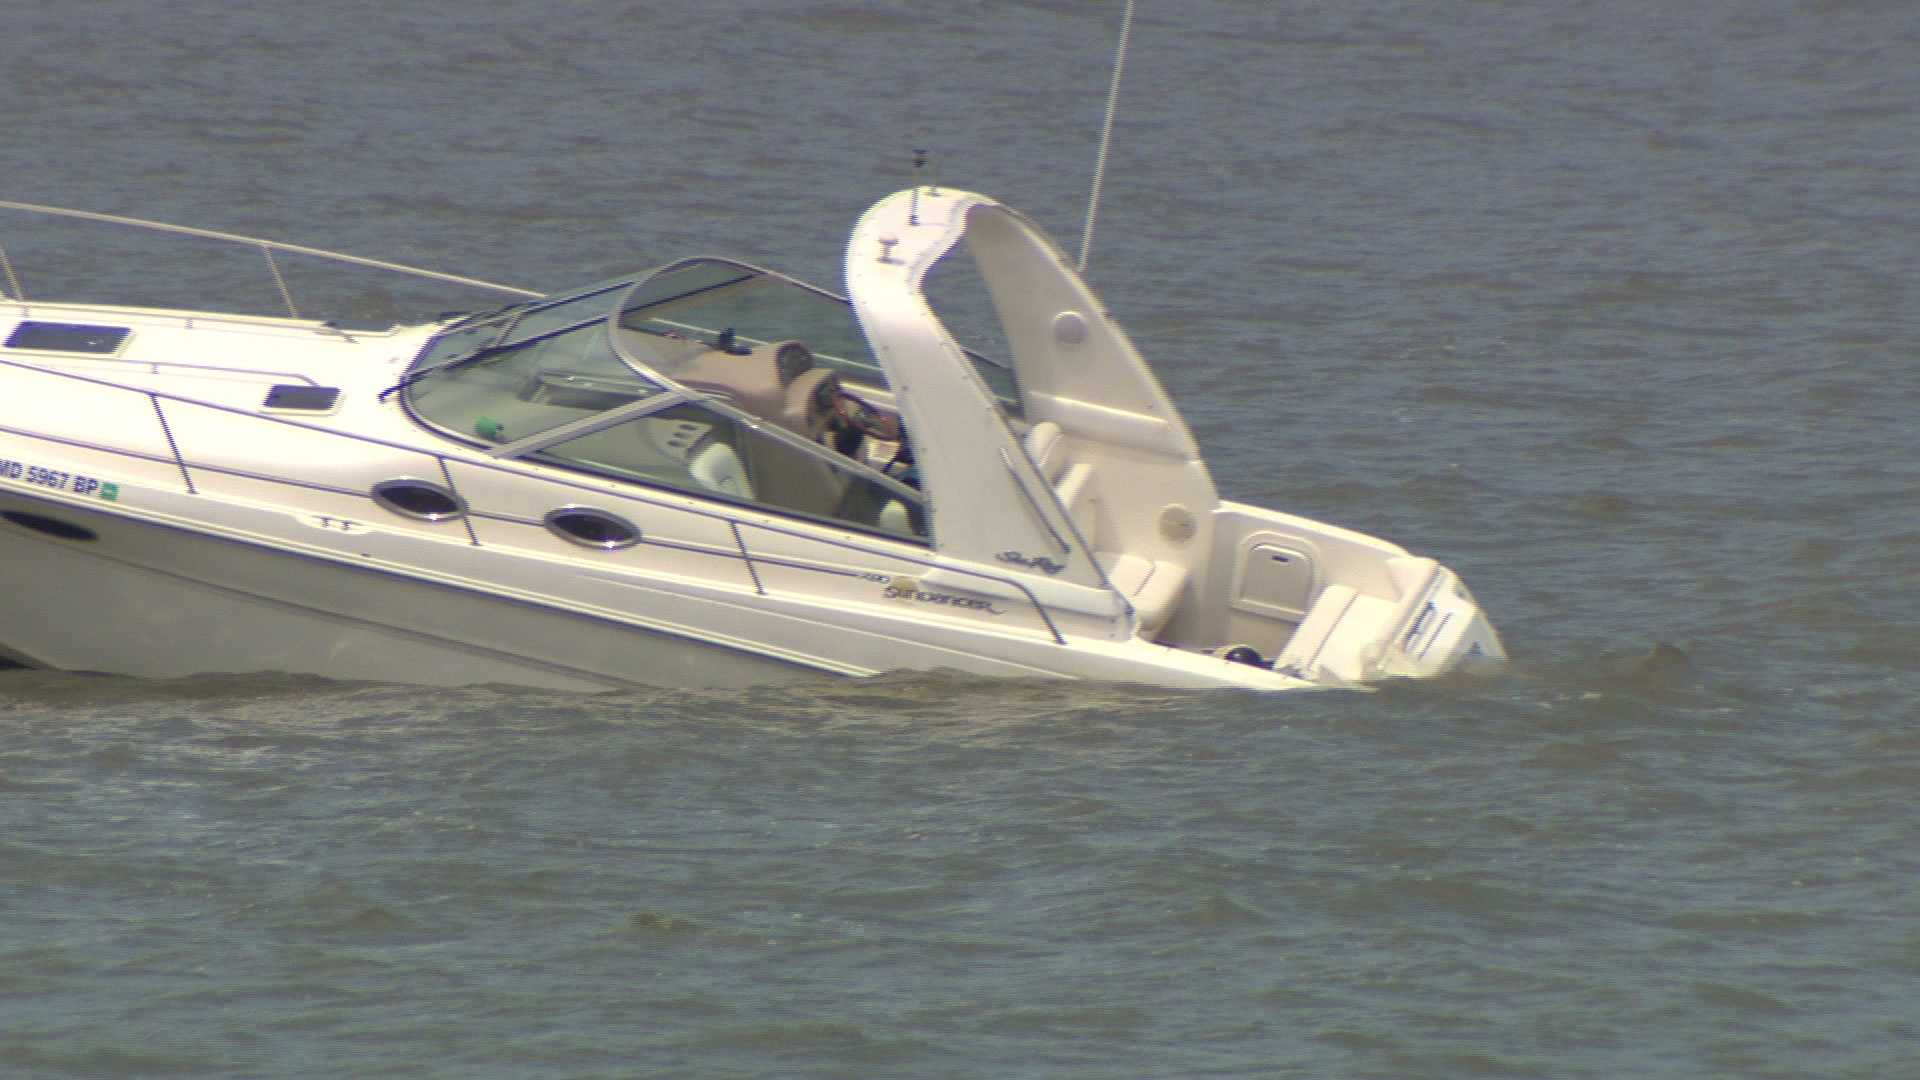 Pasadena boat crash